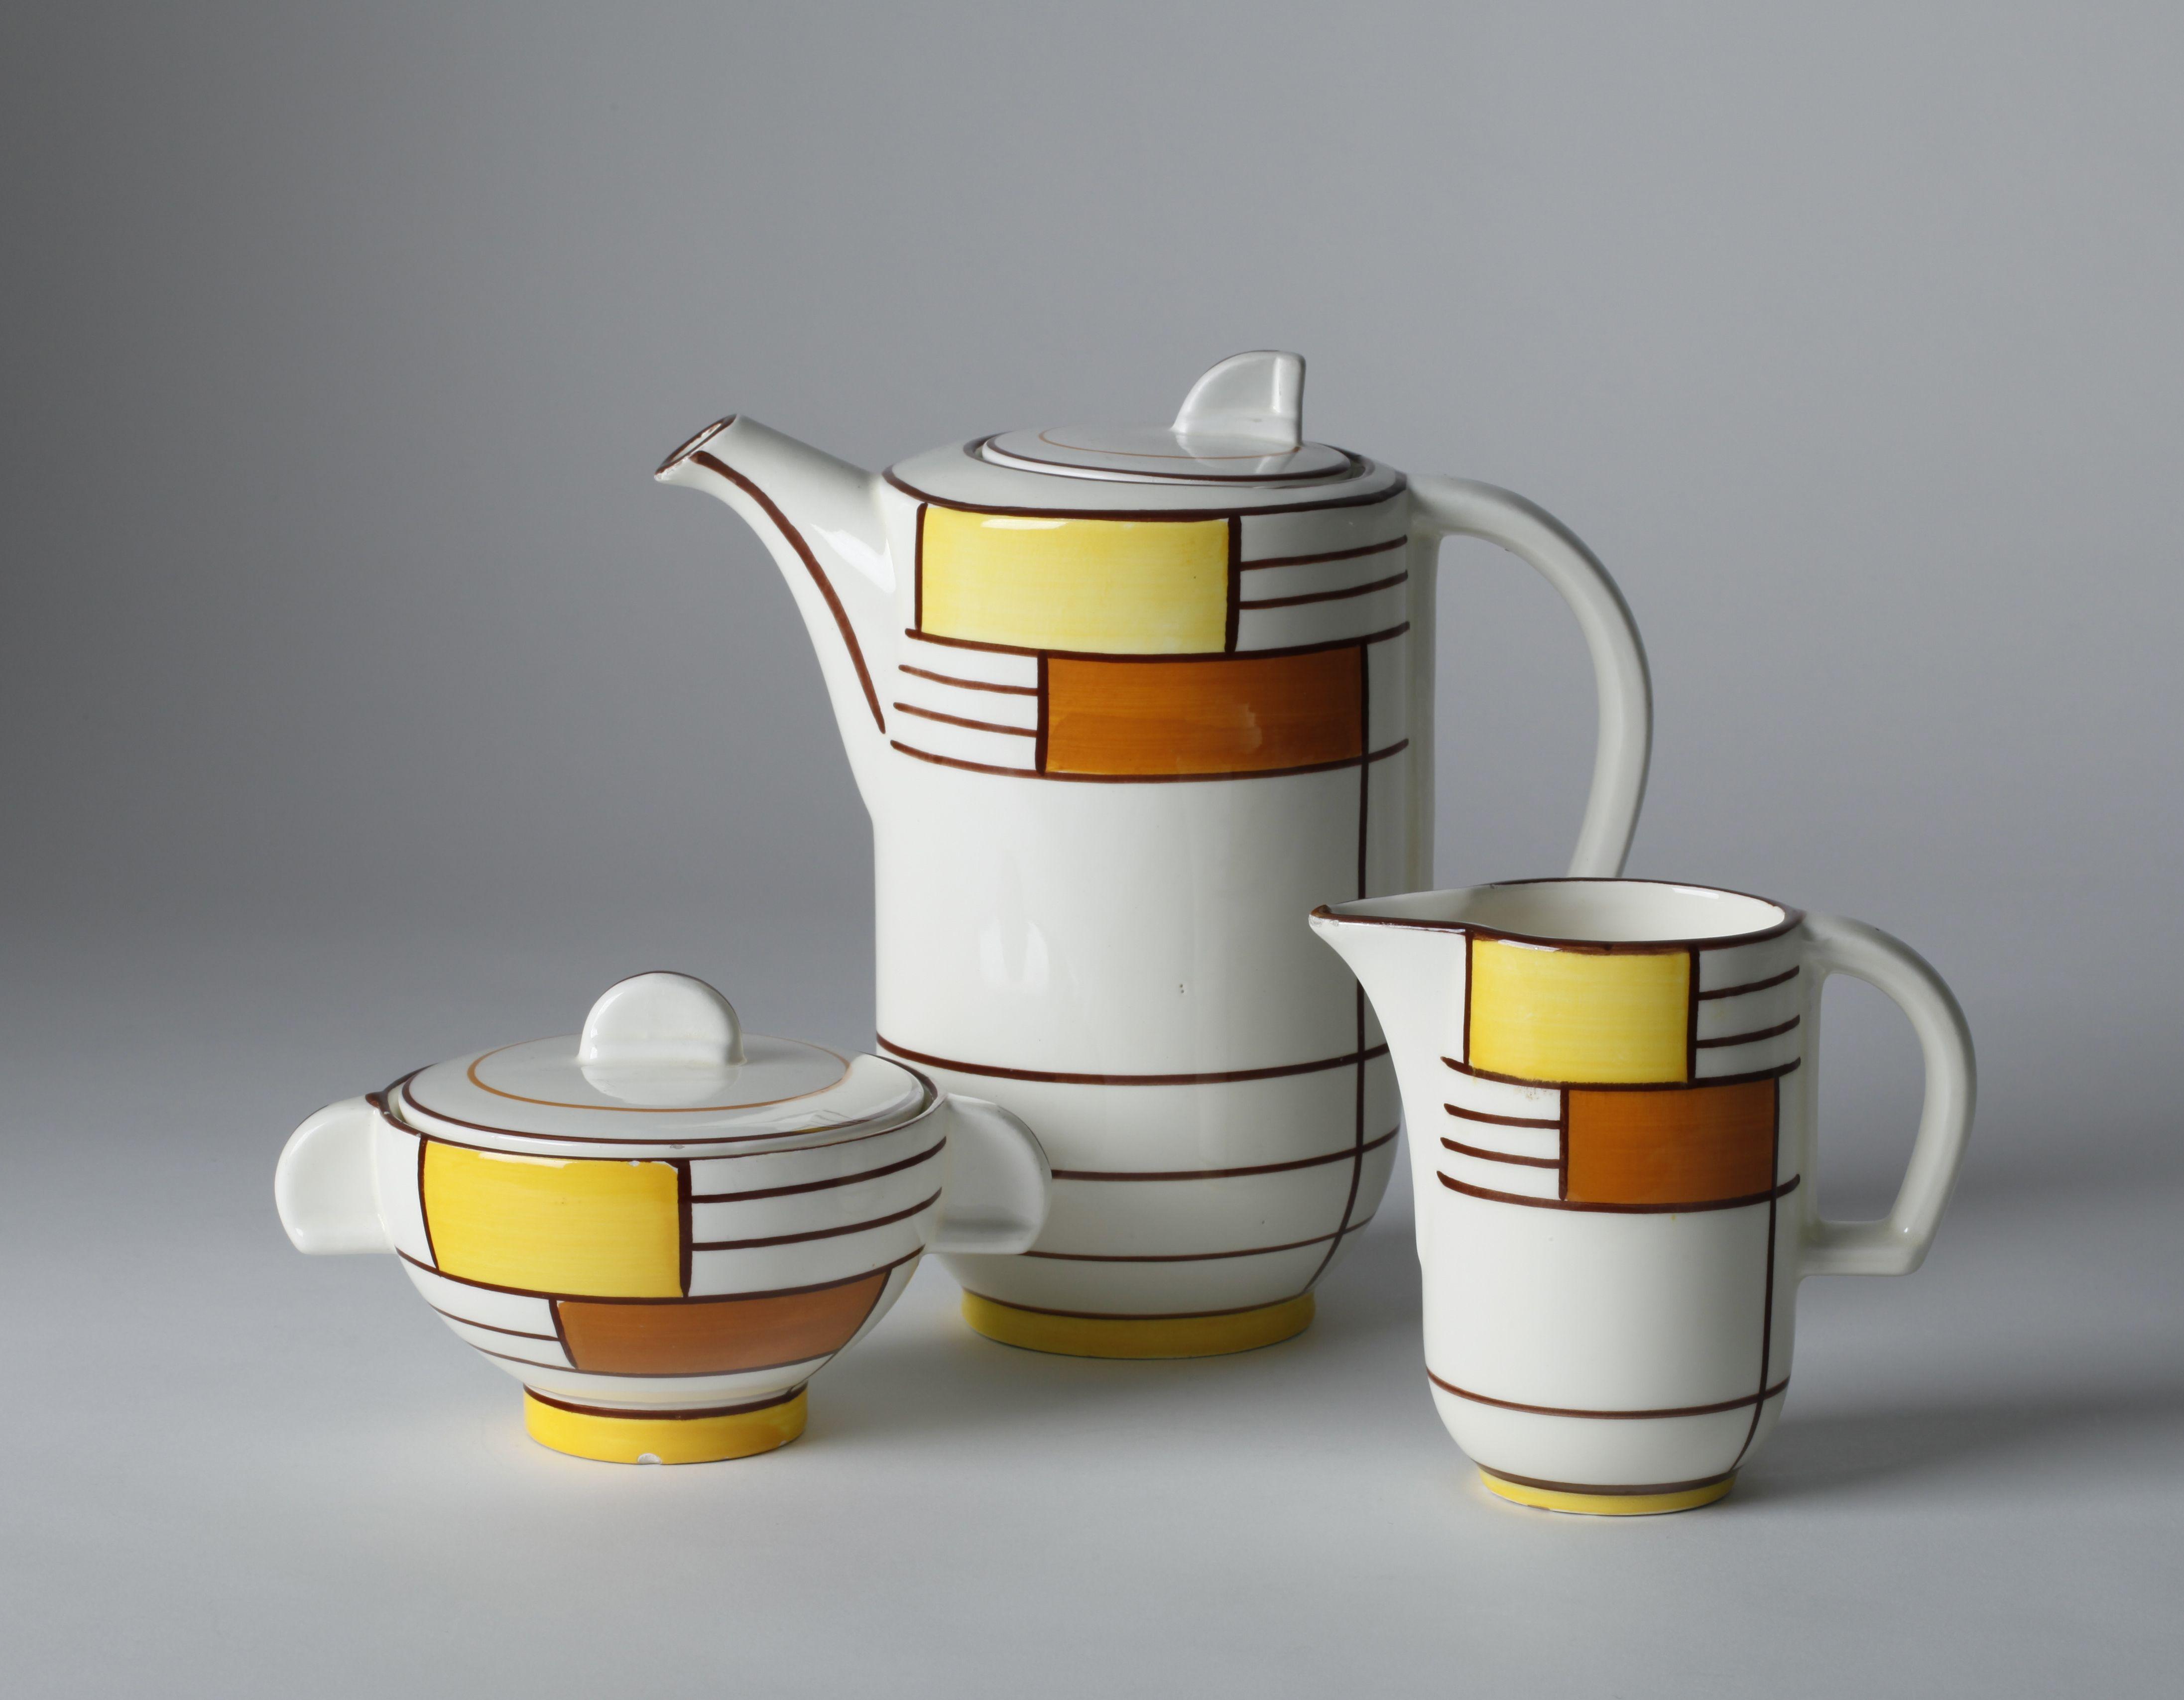 Eva Zeisel Kaffeeservice Form 3269 Dekor 3526 1929